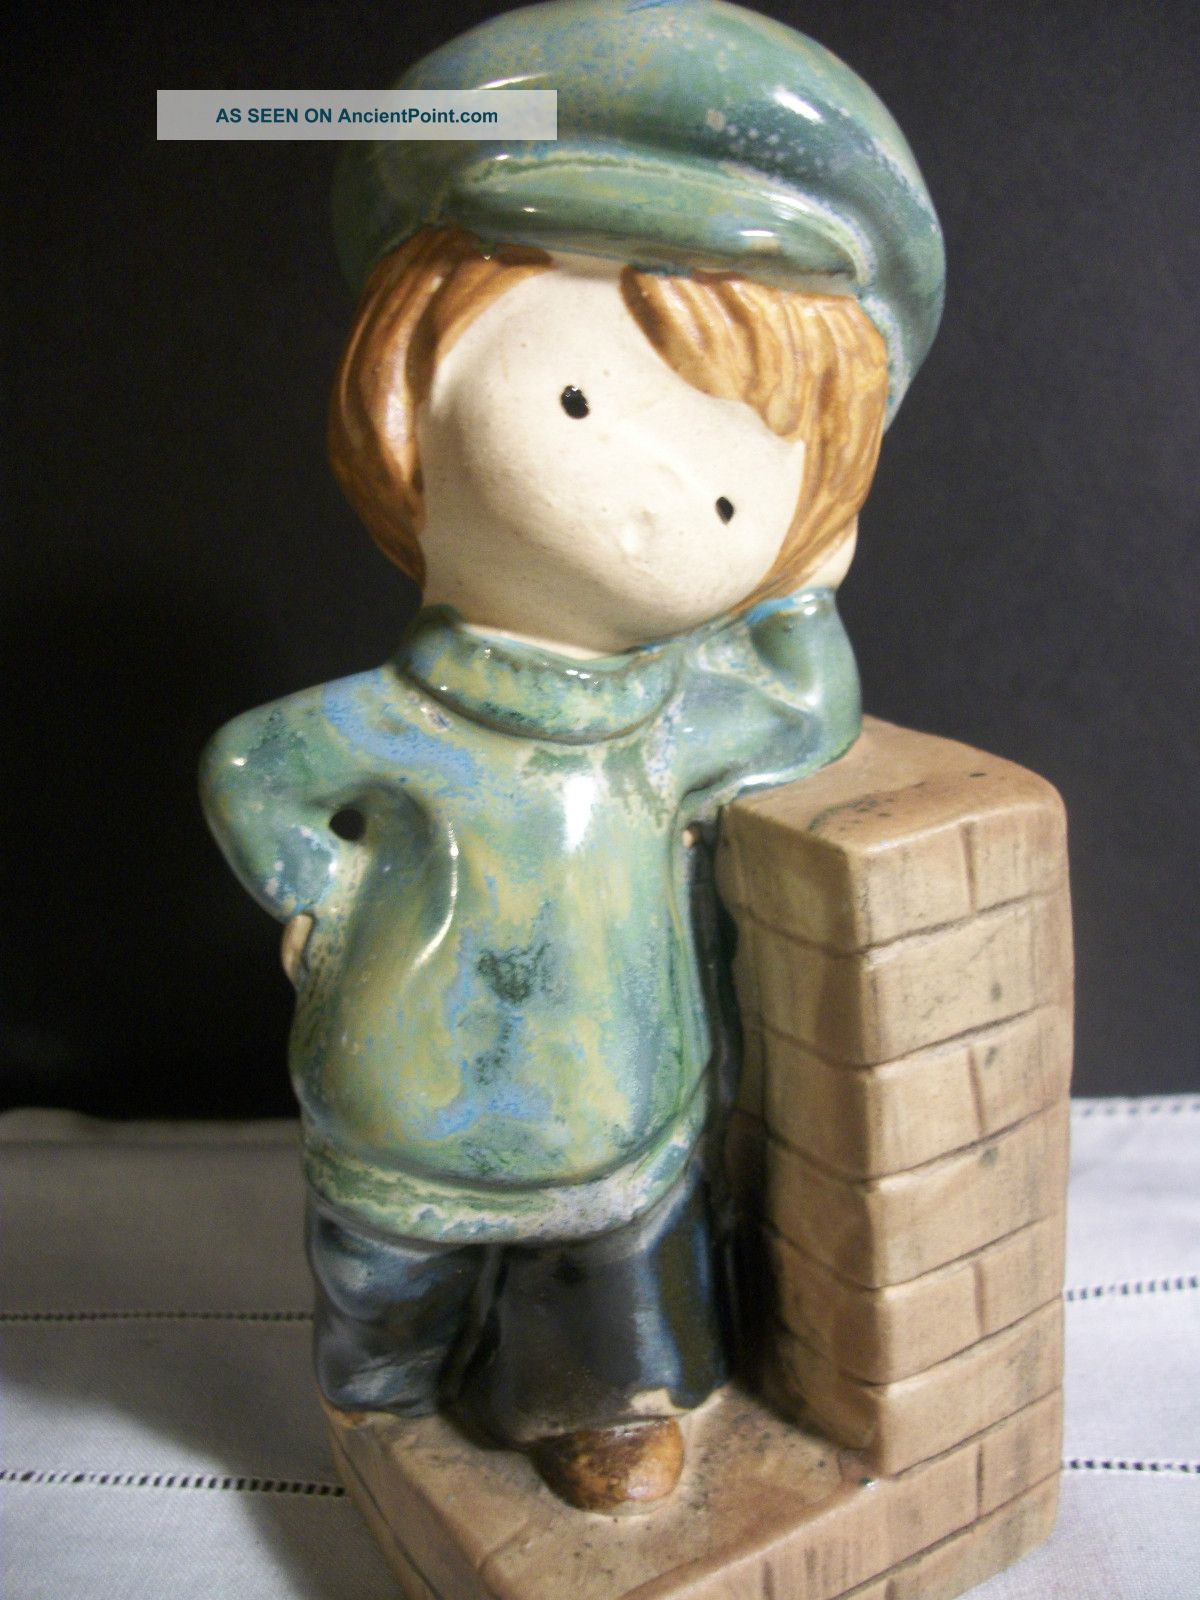 Vintage Uctci Uccti Japan Hand Painted Glaze Ceramic Pottery Boy On Brick Wall Figurines photo